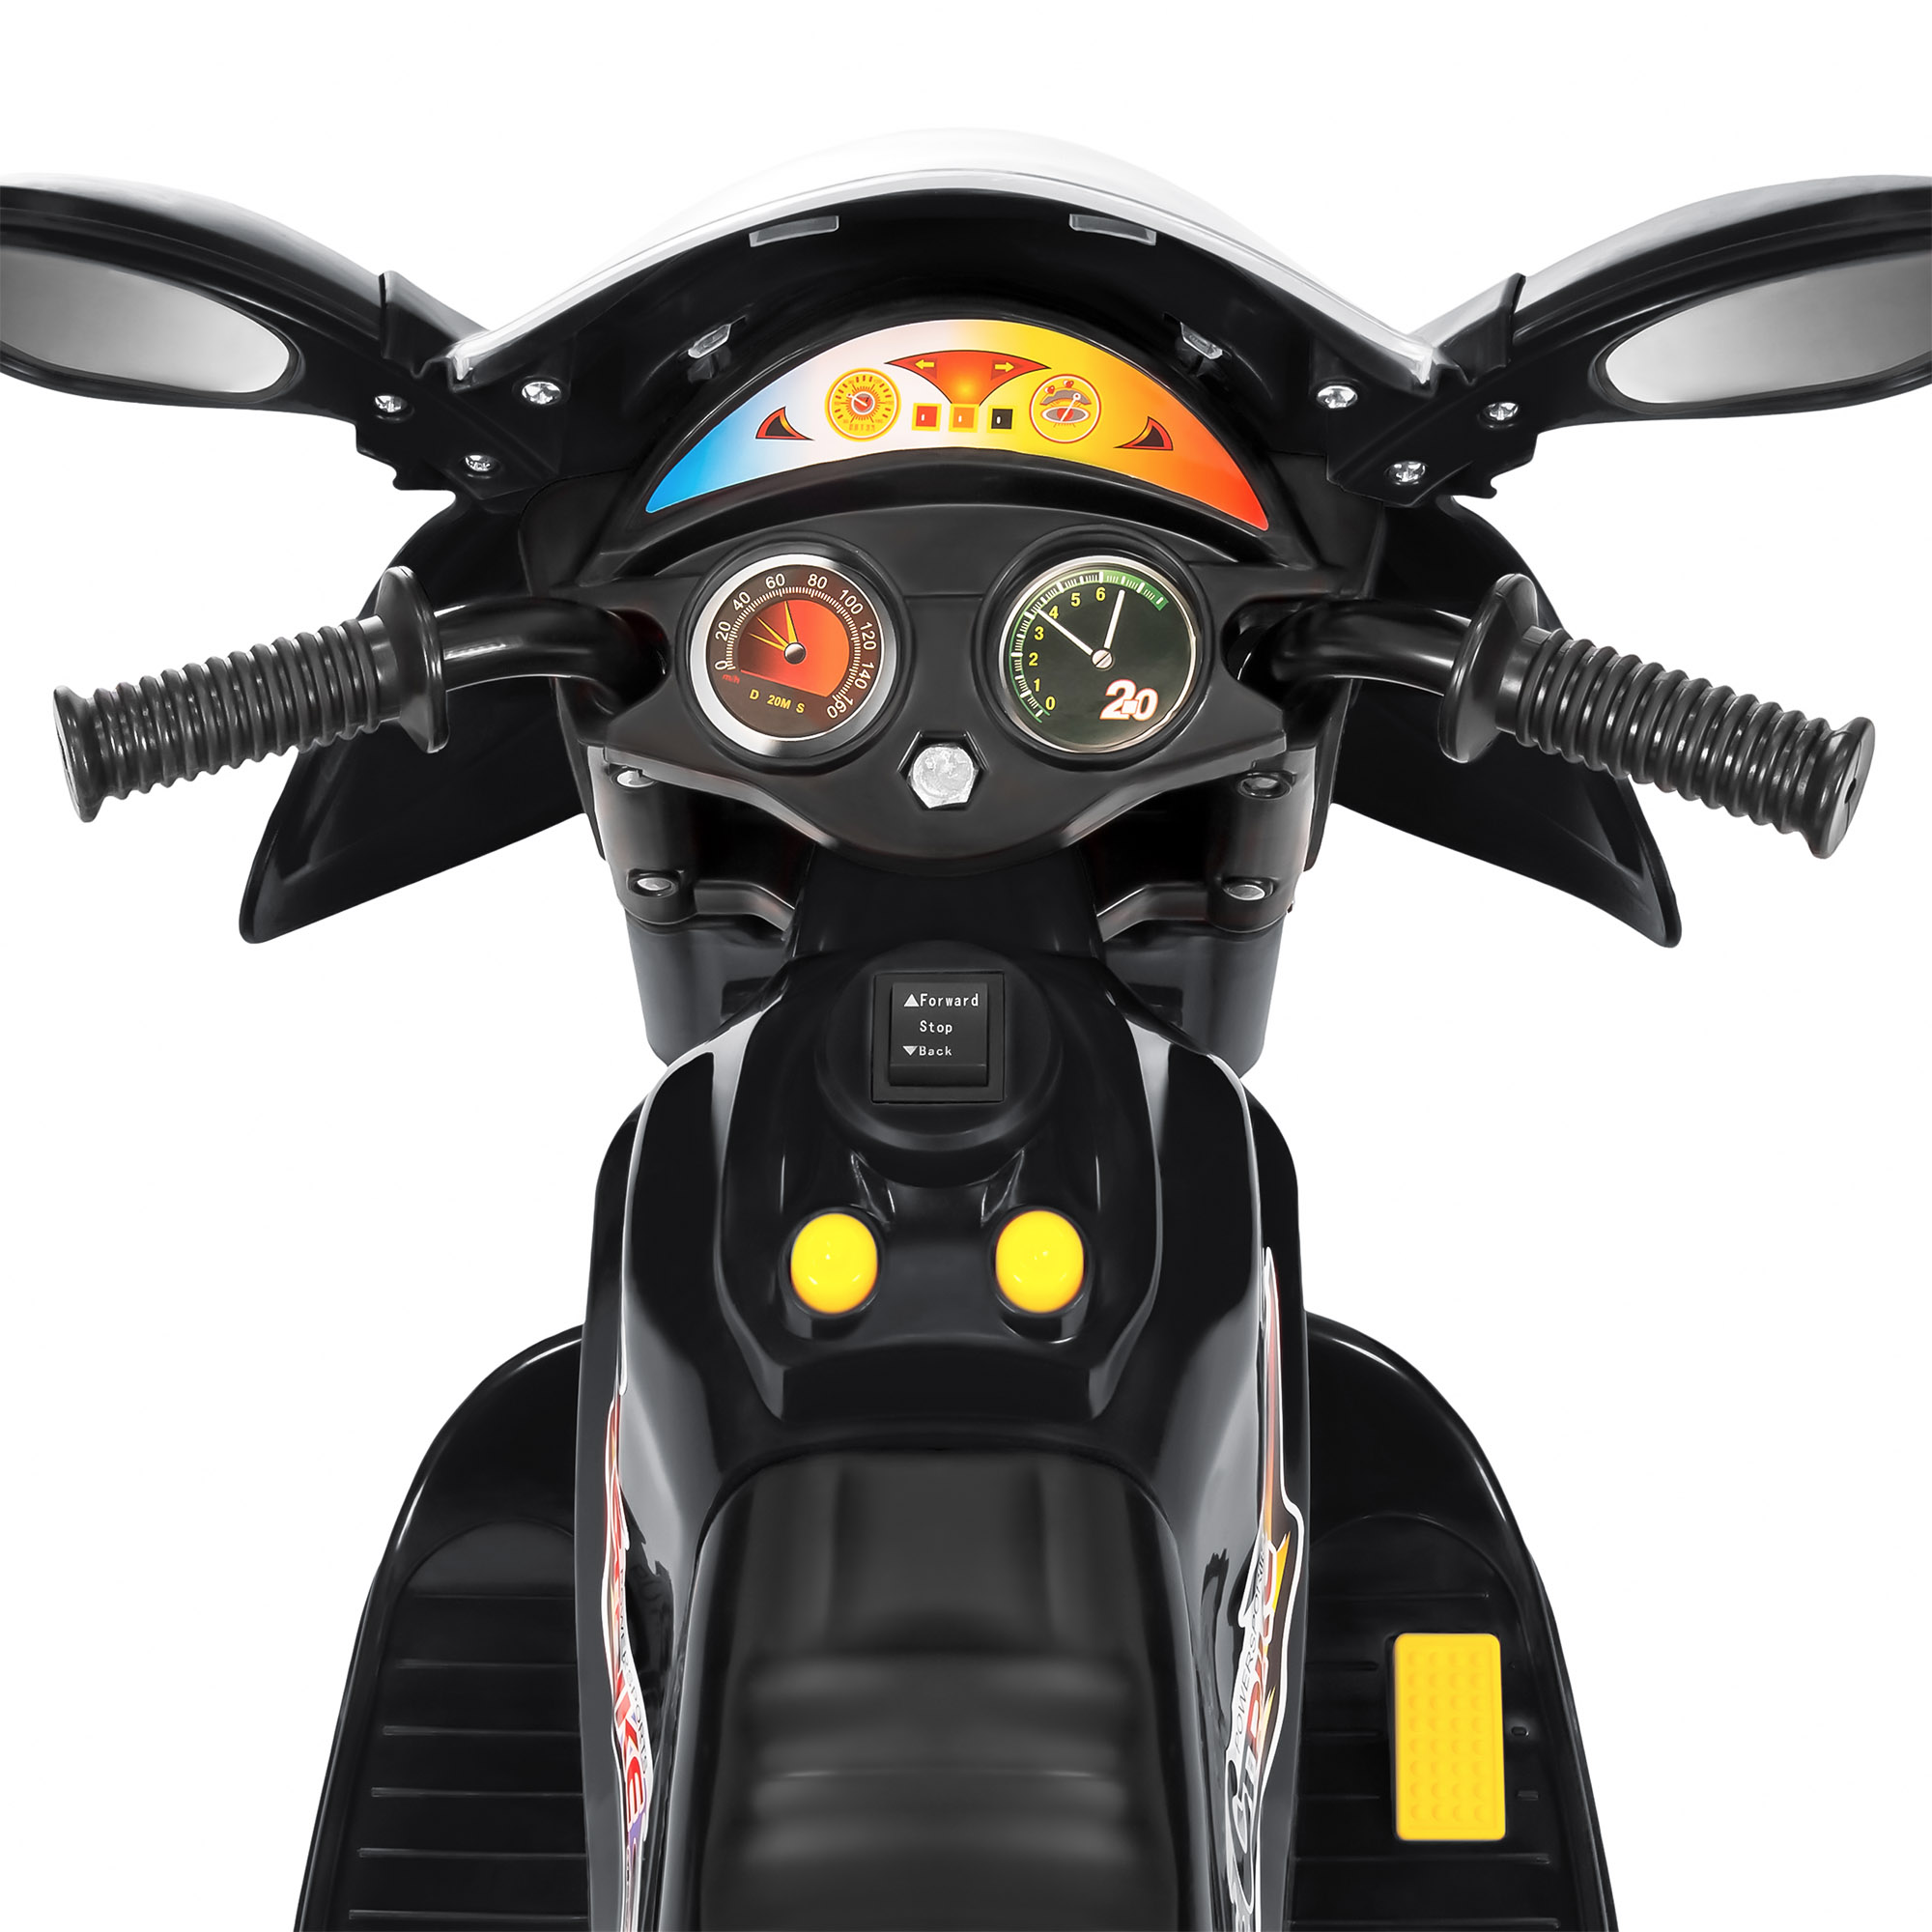 BCP-6V-Kids-3-Wheel-Motorcycle-Ride-On-Toy-w-LED-Lights-Music-Storage thumbnail 11